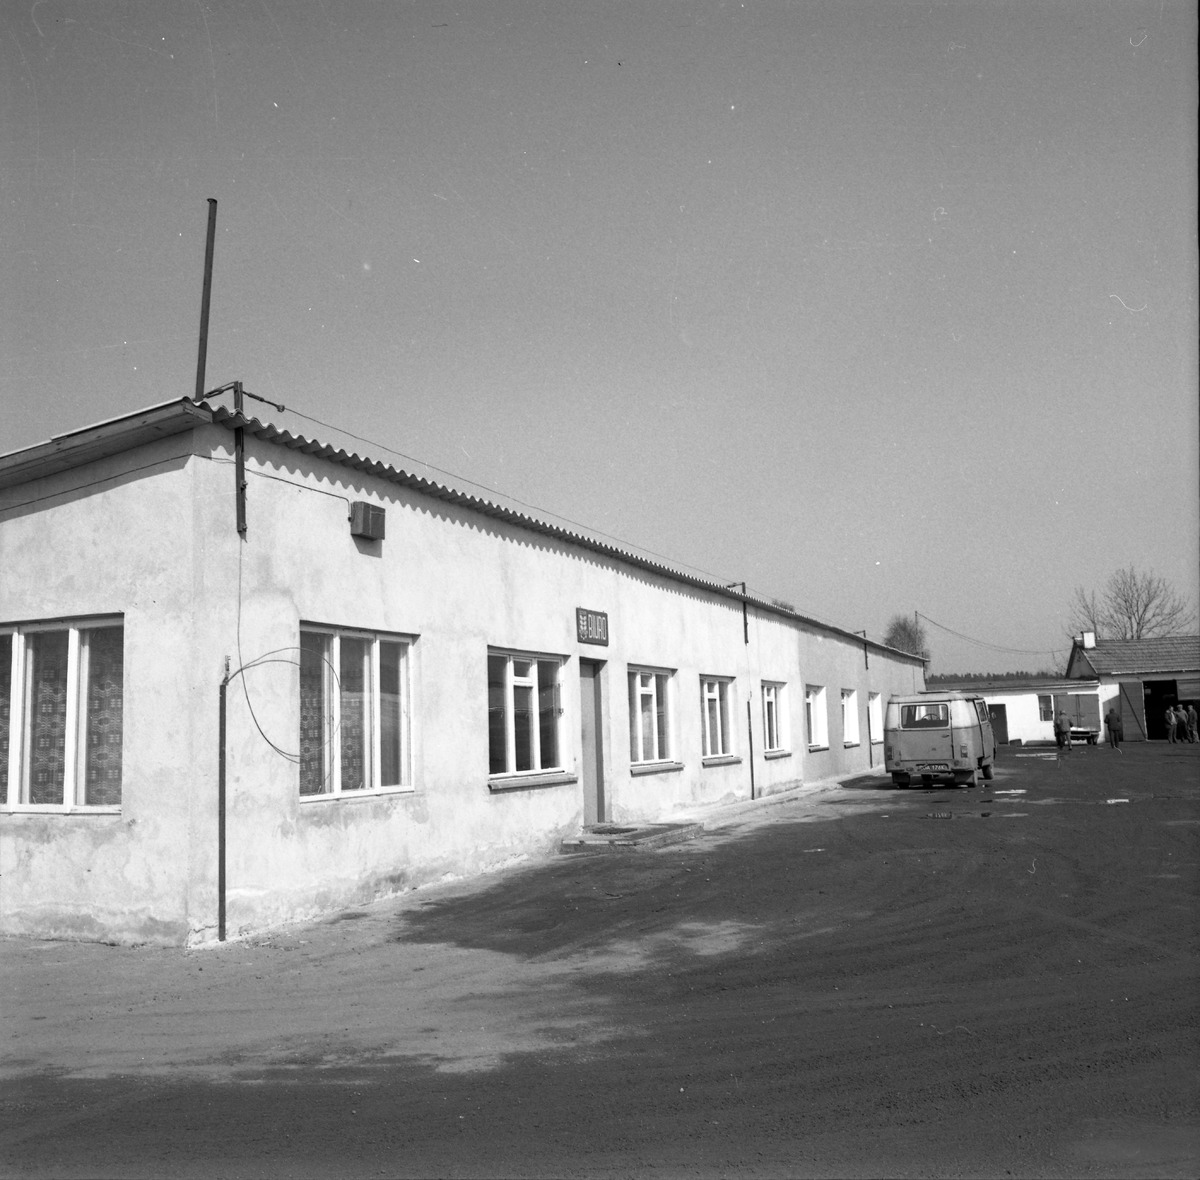 Biuro bazy transportowej [1]